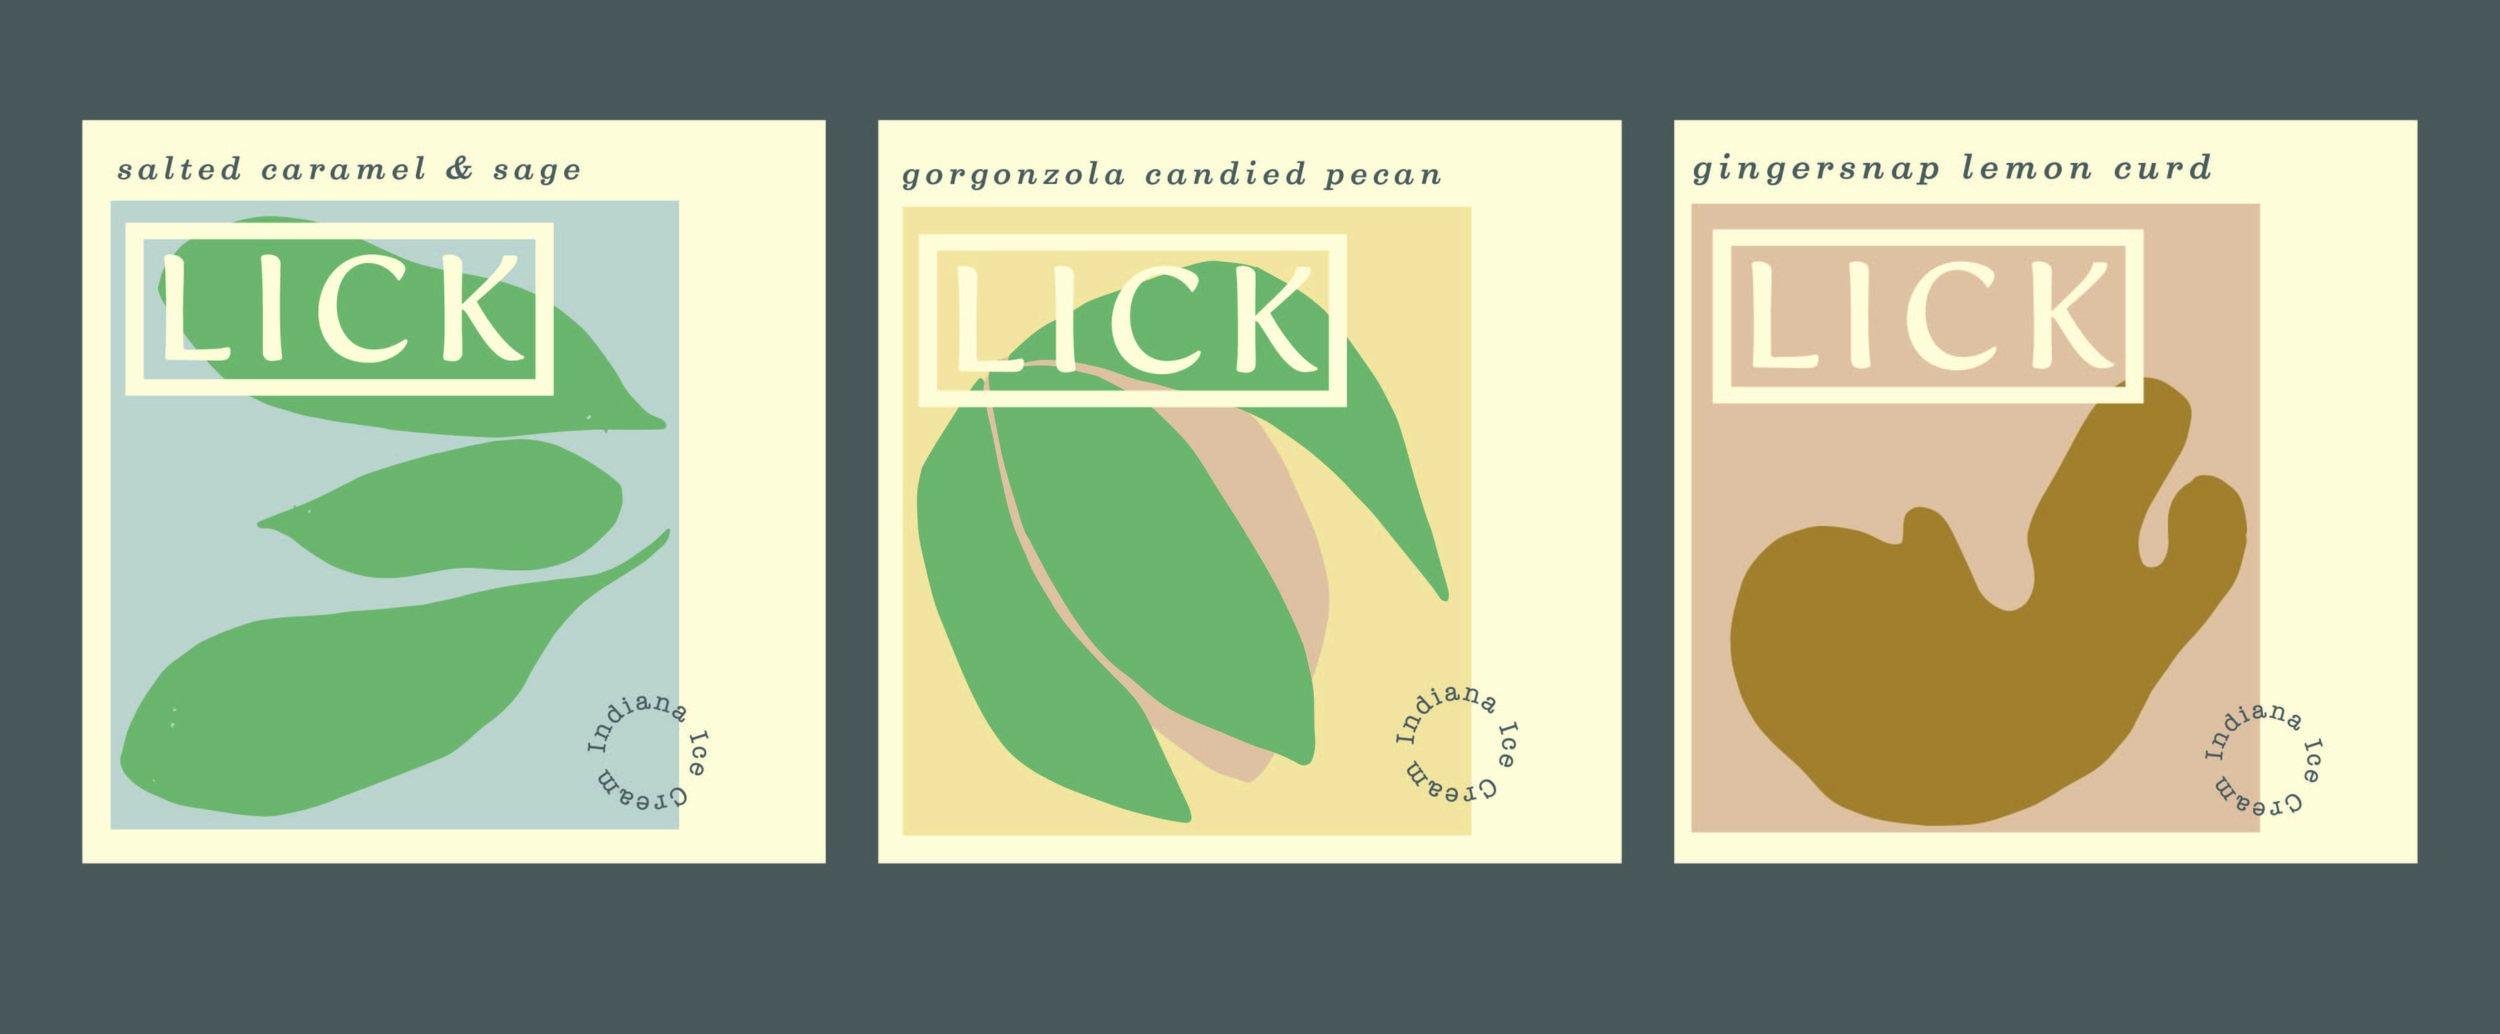 Lick_ArtSpeak_Presentation.jpg